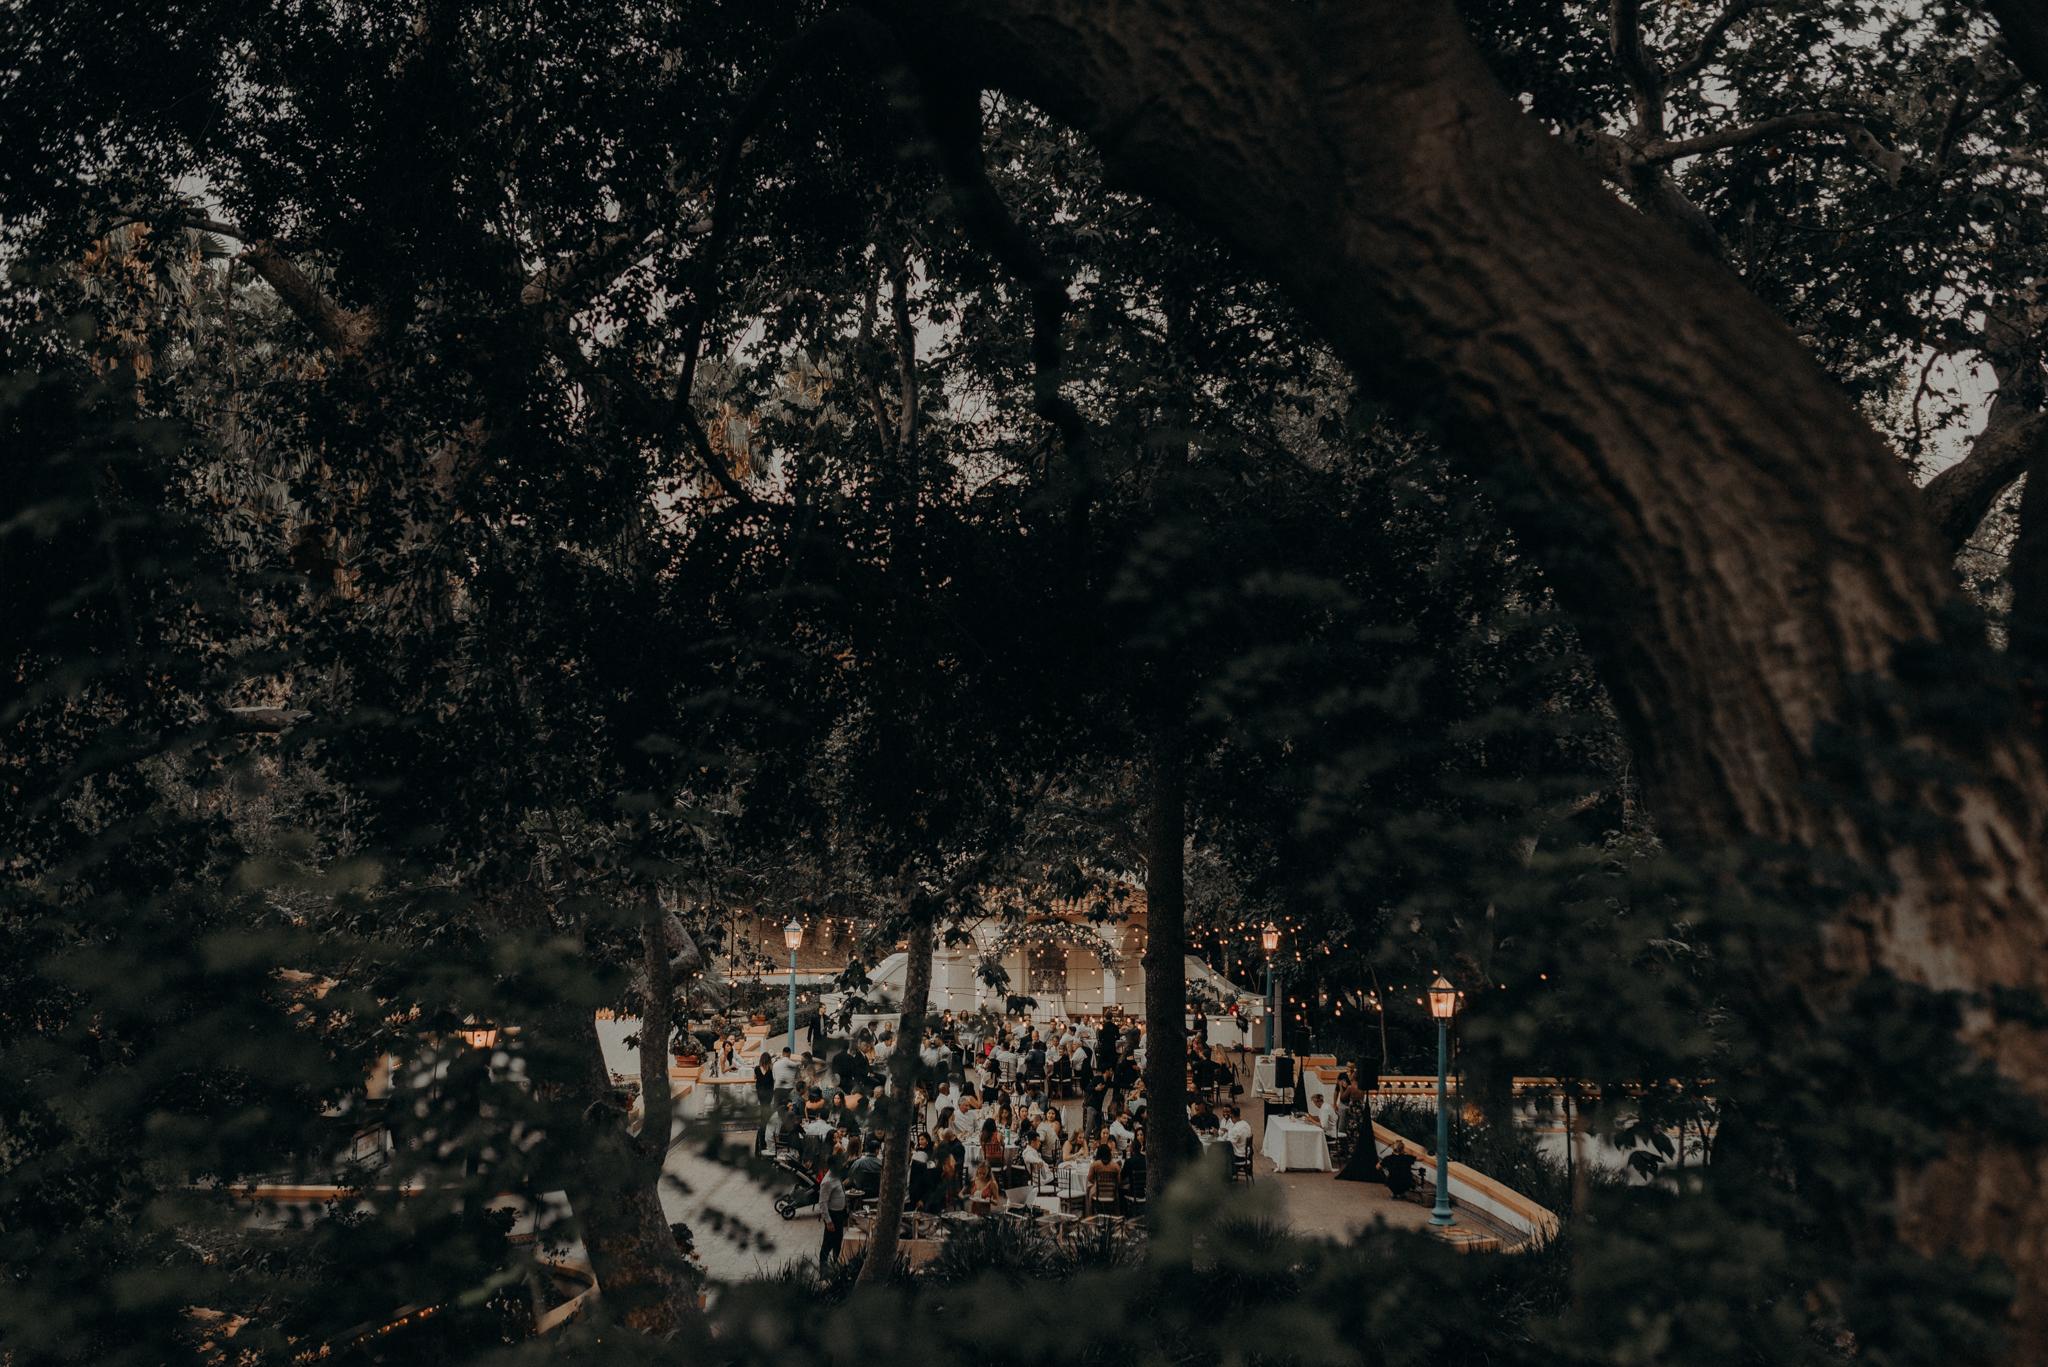 Isaiah + Taylor Photography - Rancho Las Lomas Wedding, Los Angeles Wedding Photographer-140.jpg